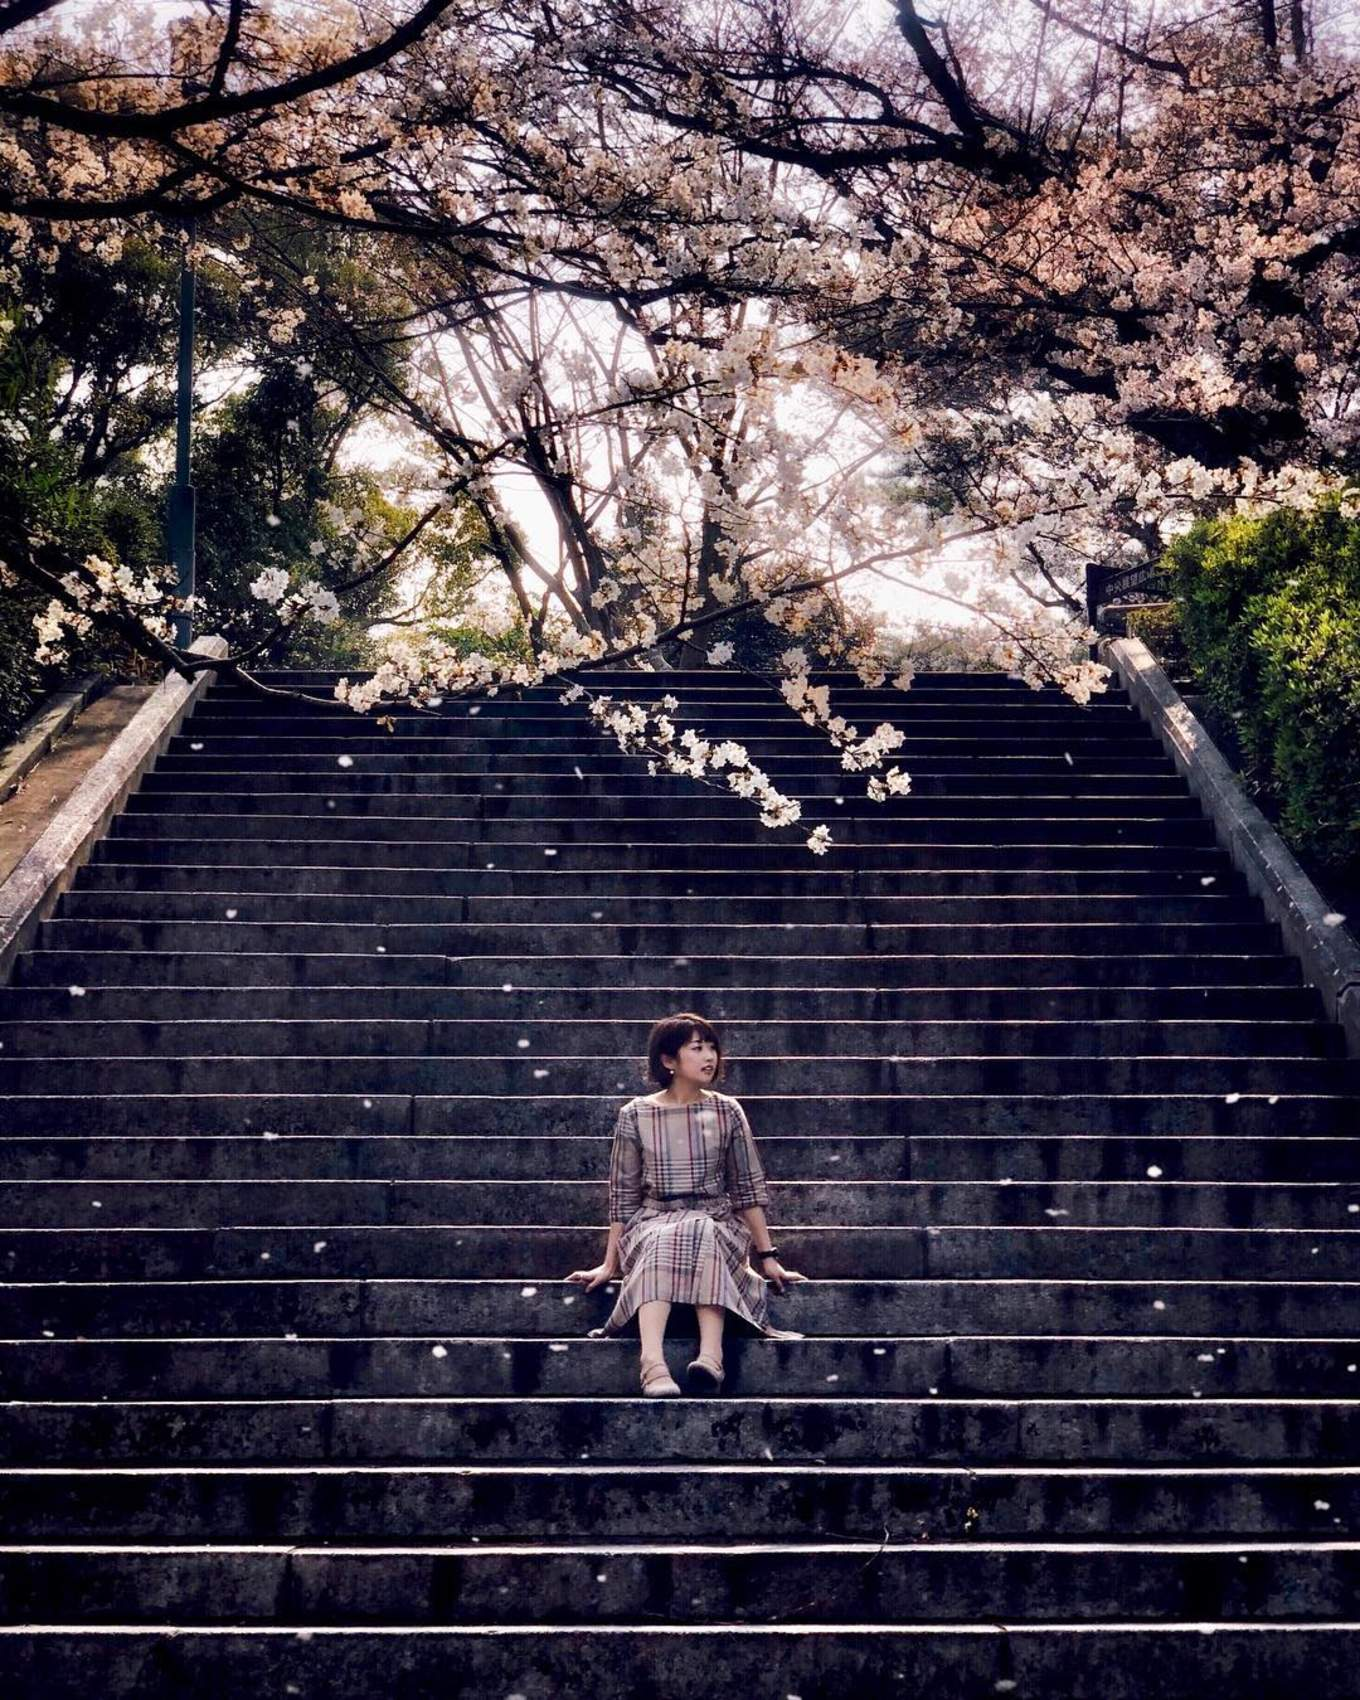 Falling sakura in Nishi Park